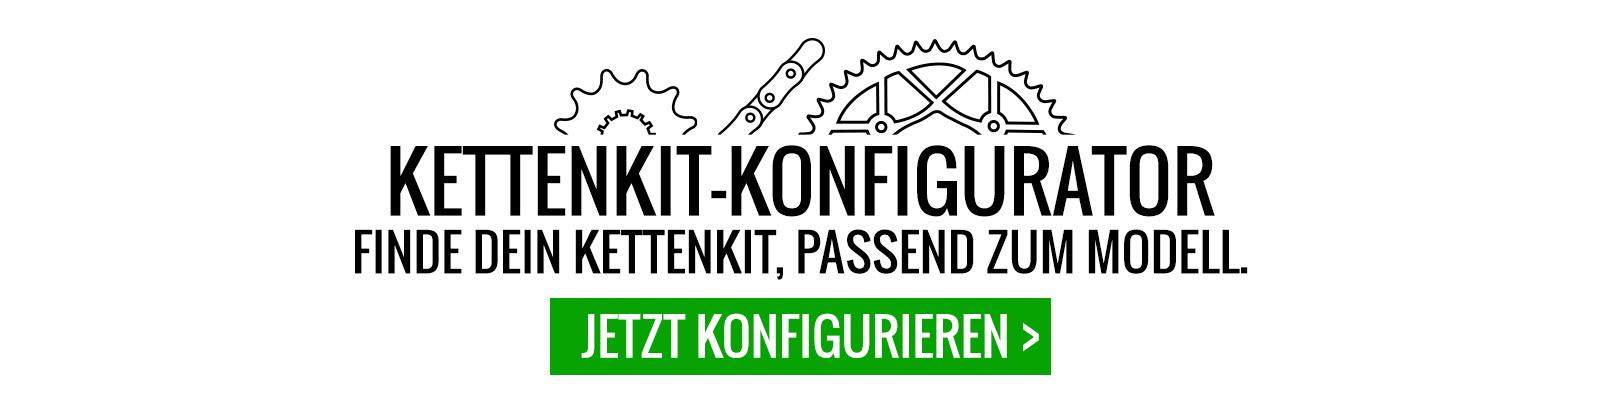 Motocross & Enduro Kettenkit Konfigurator